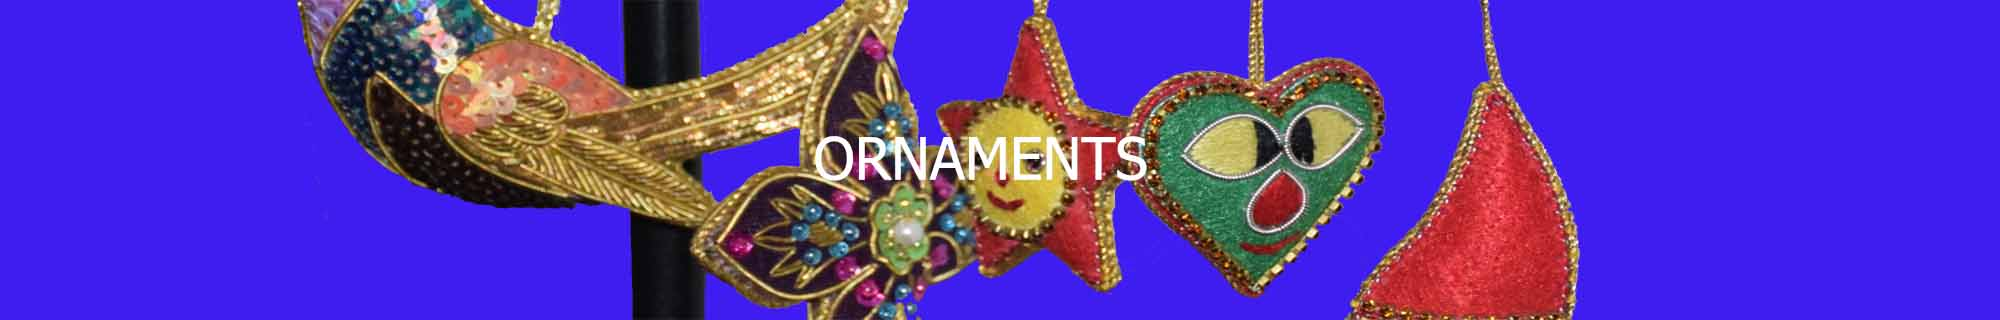 Ornaments & Hangings